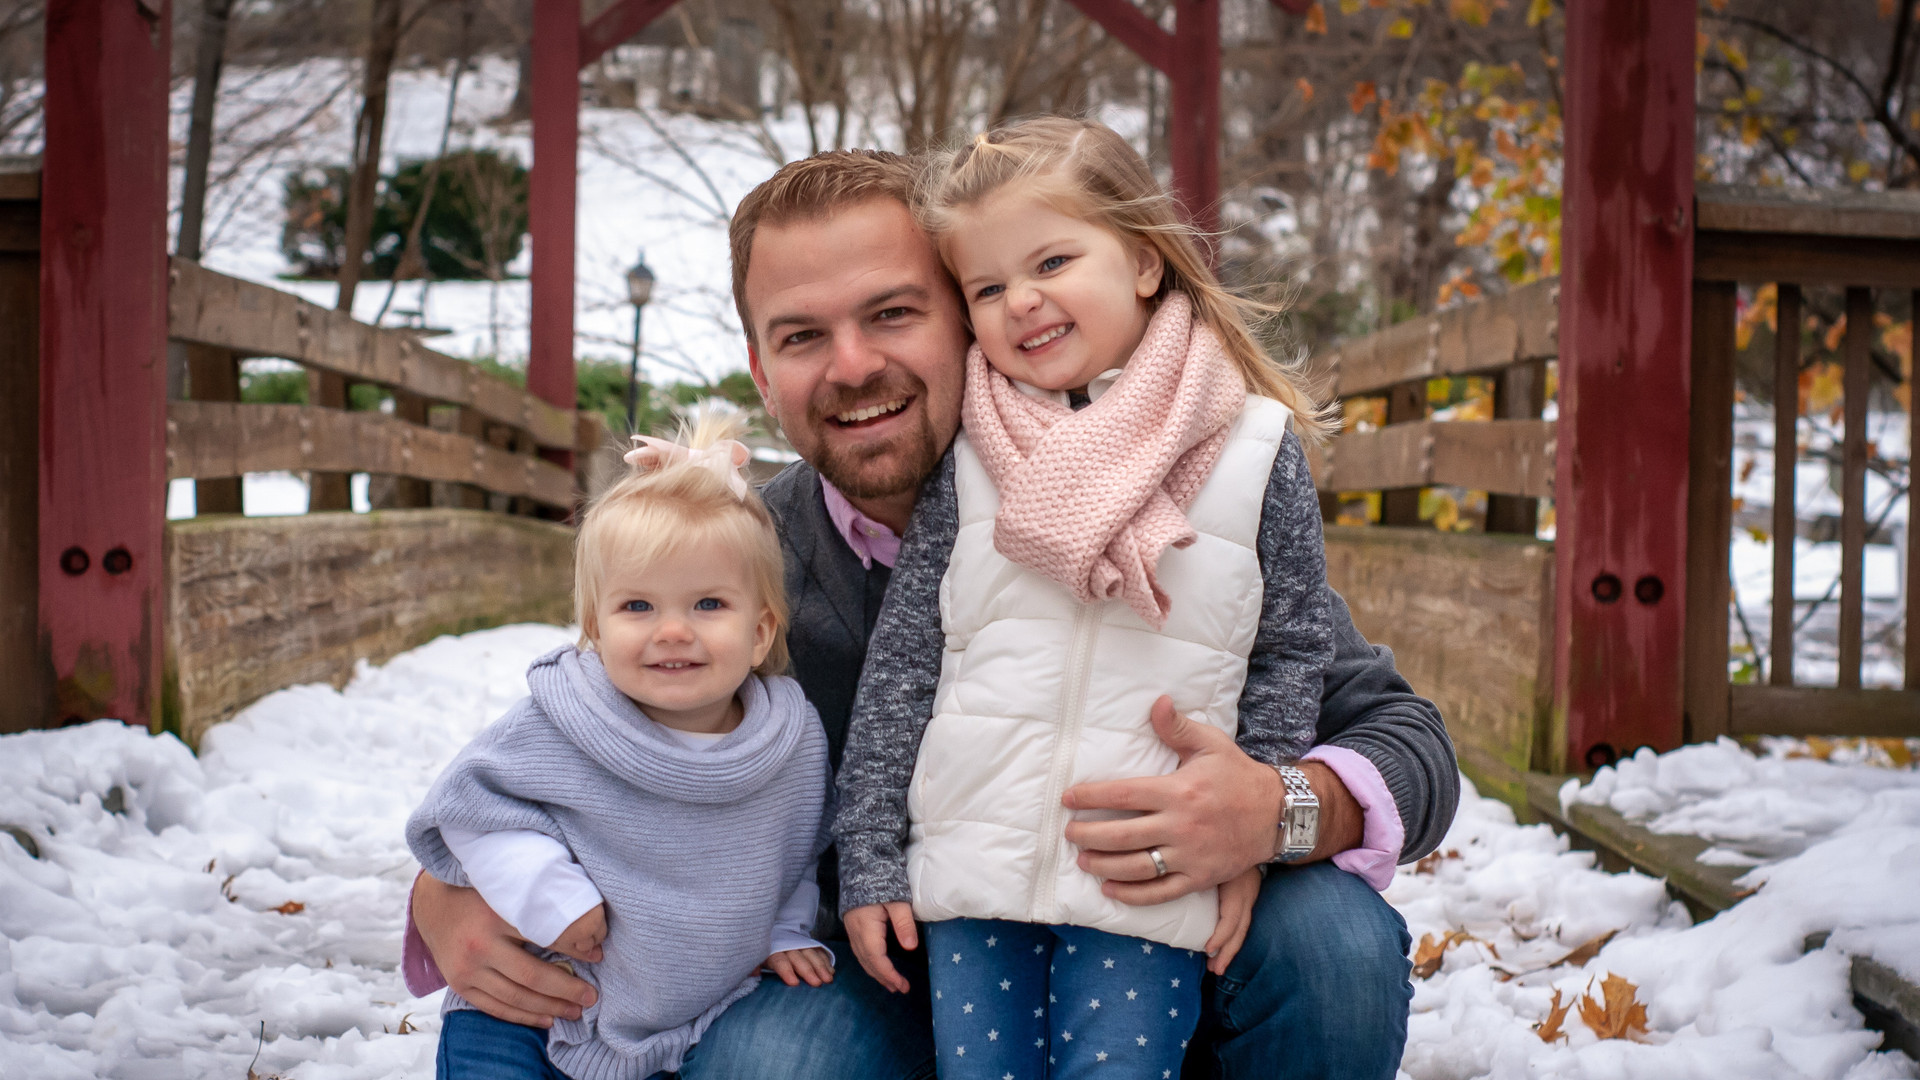 Family Session - Covered Bridge Park, Orefield, PA